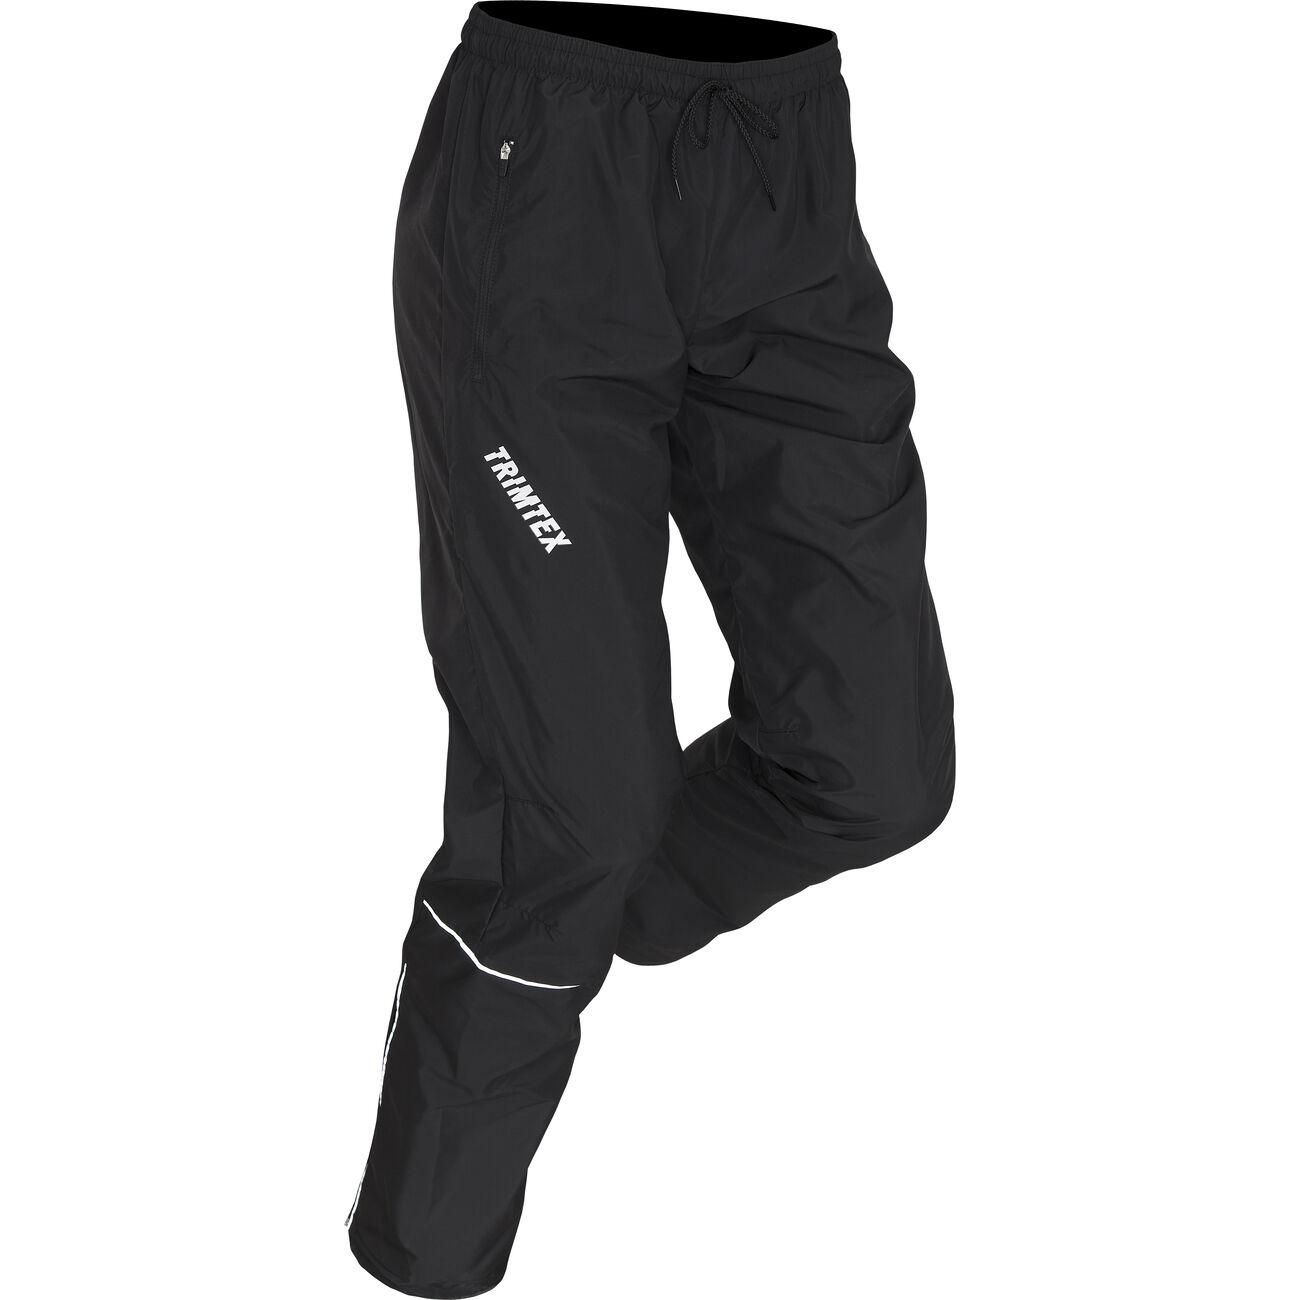 Performance training pants men's